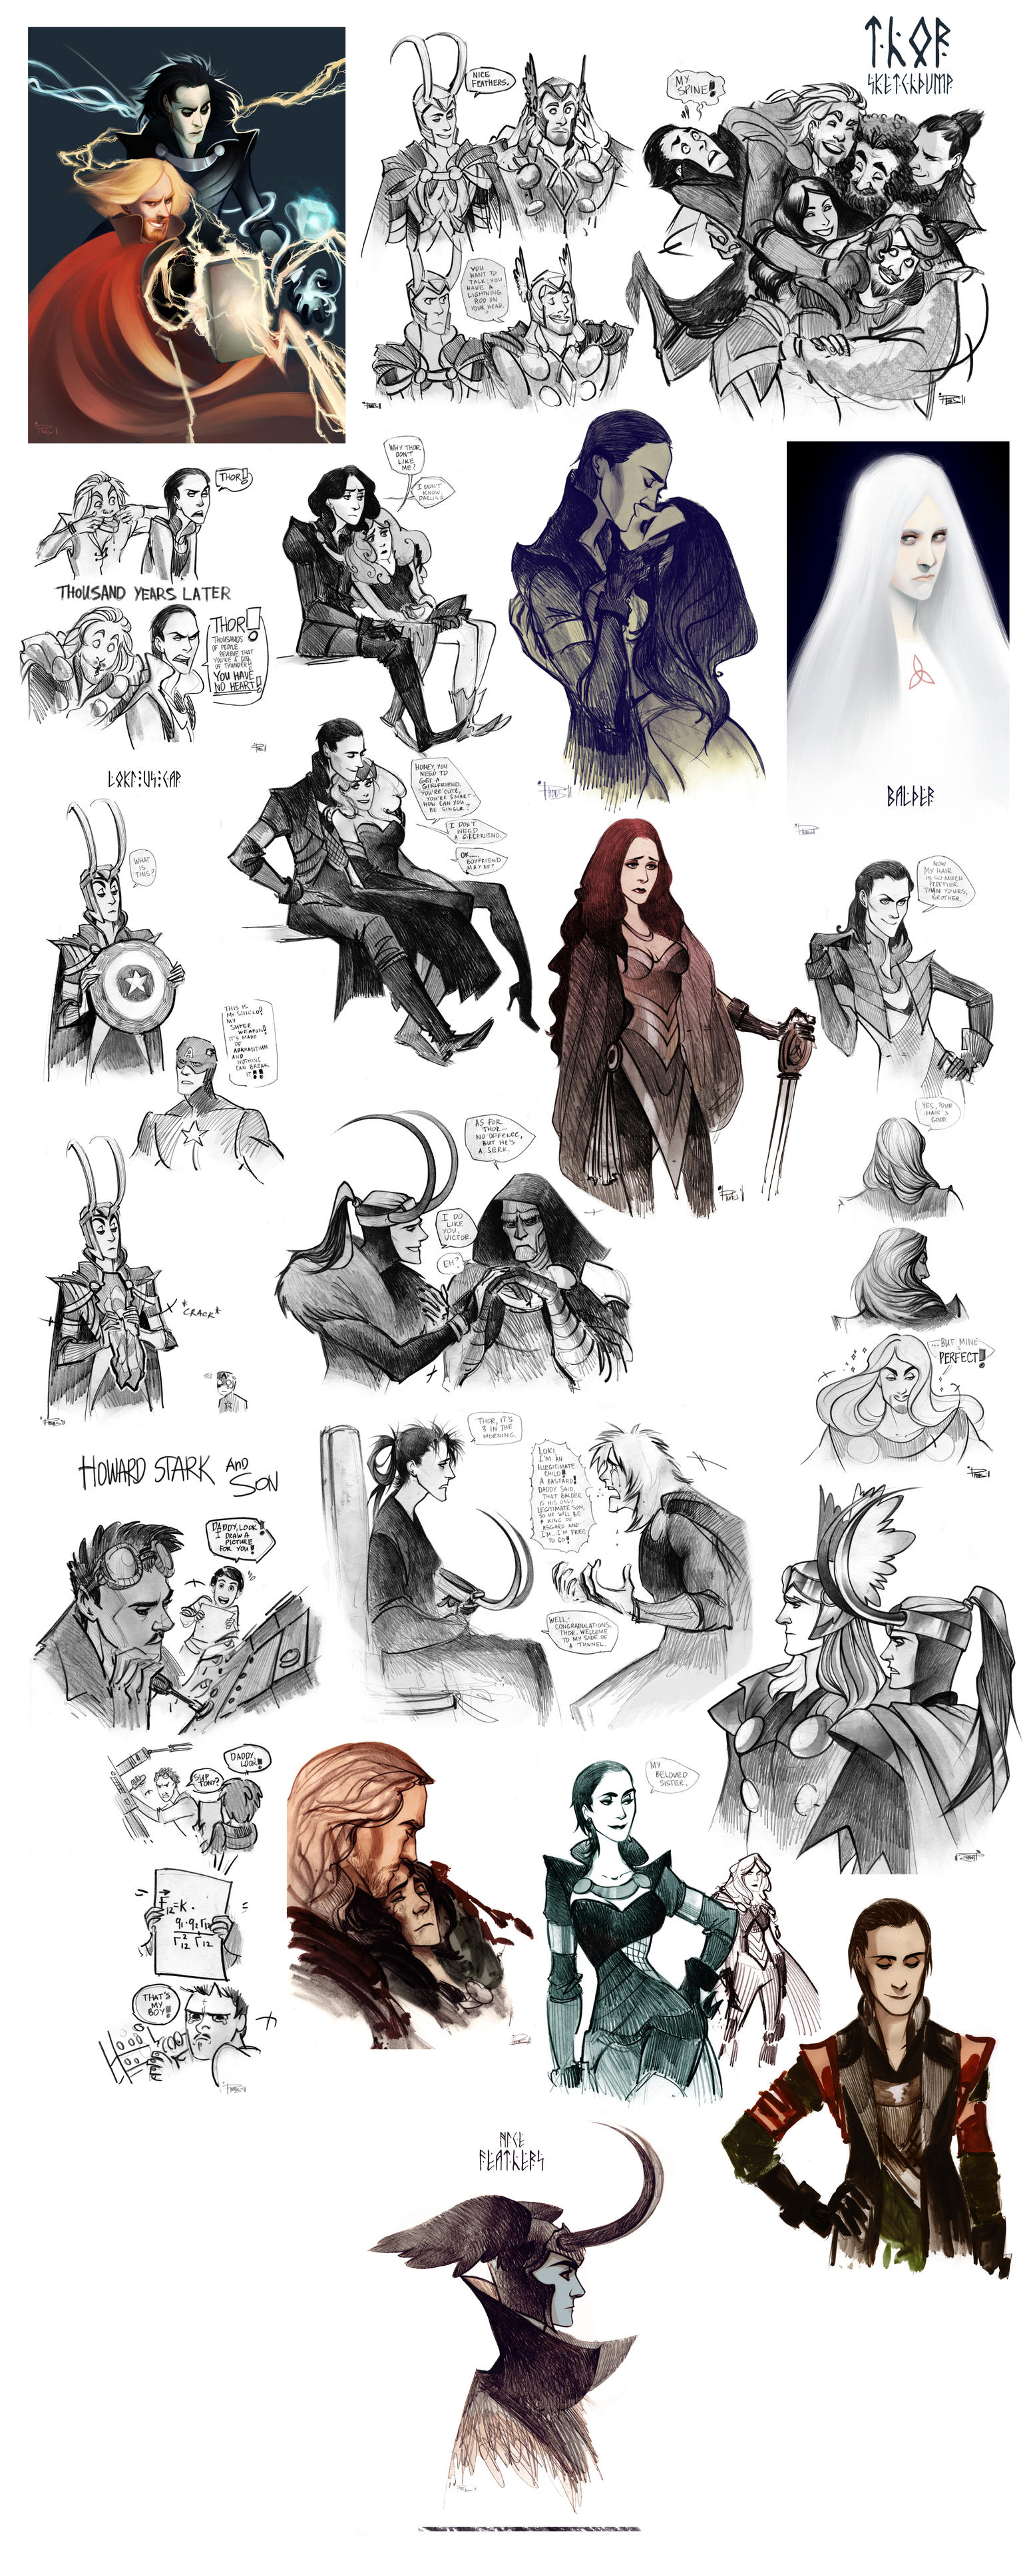 Thor sketchdump III by Phobs